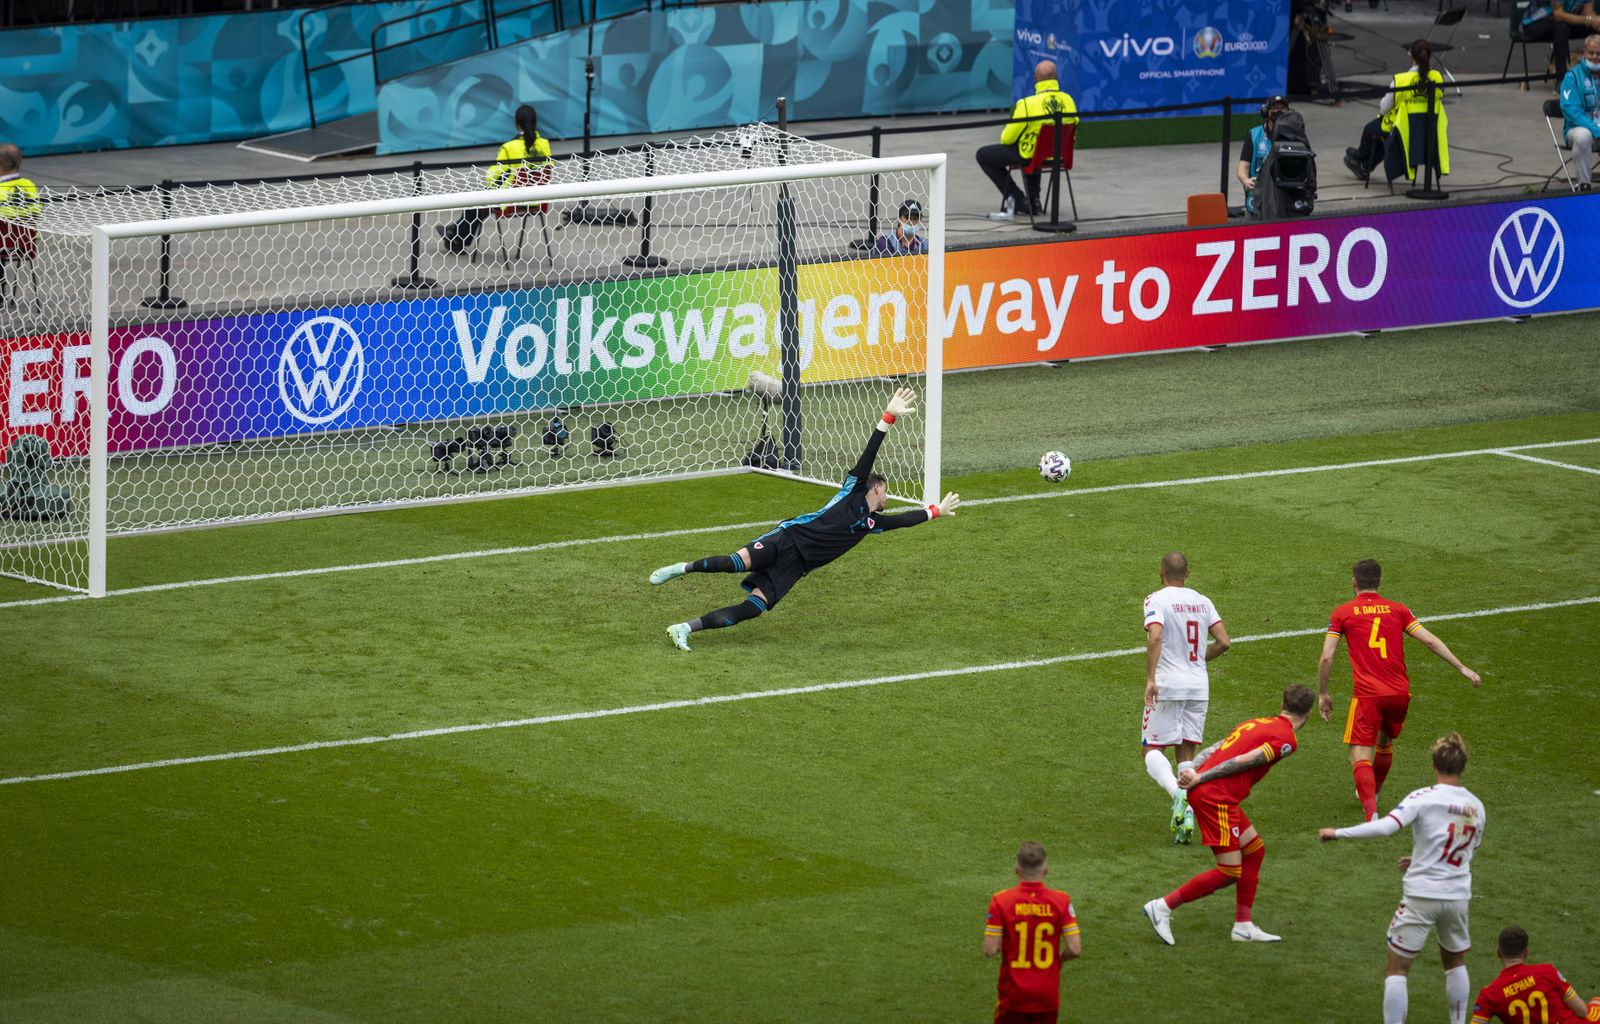 Tor zum 0:1 durch Kasper Dolberg (Dänemark) gegen Torwart Danny Ward (Wales) Wales - Dänemark Amsterdam, 26.06.2021, Fus